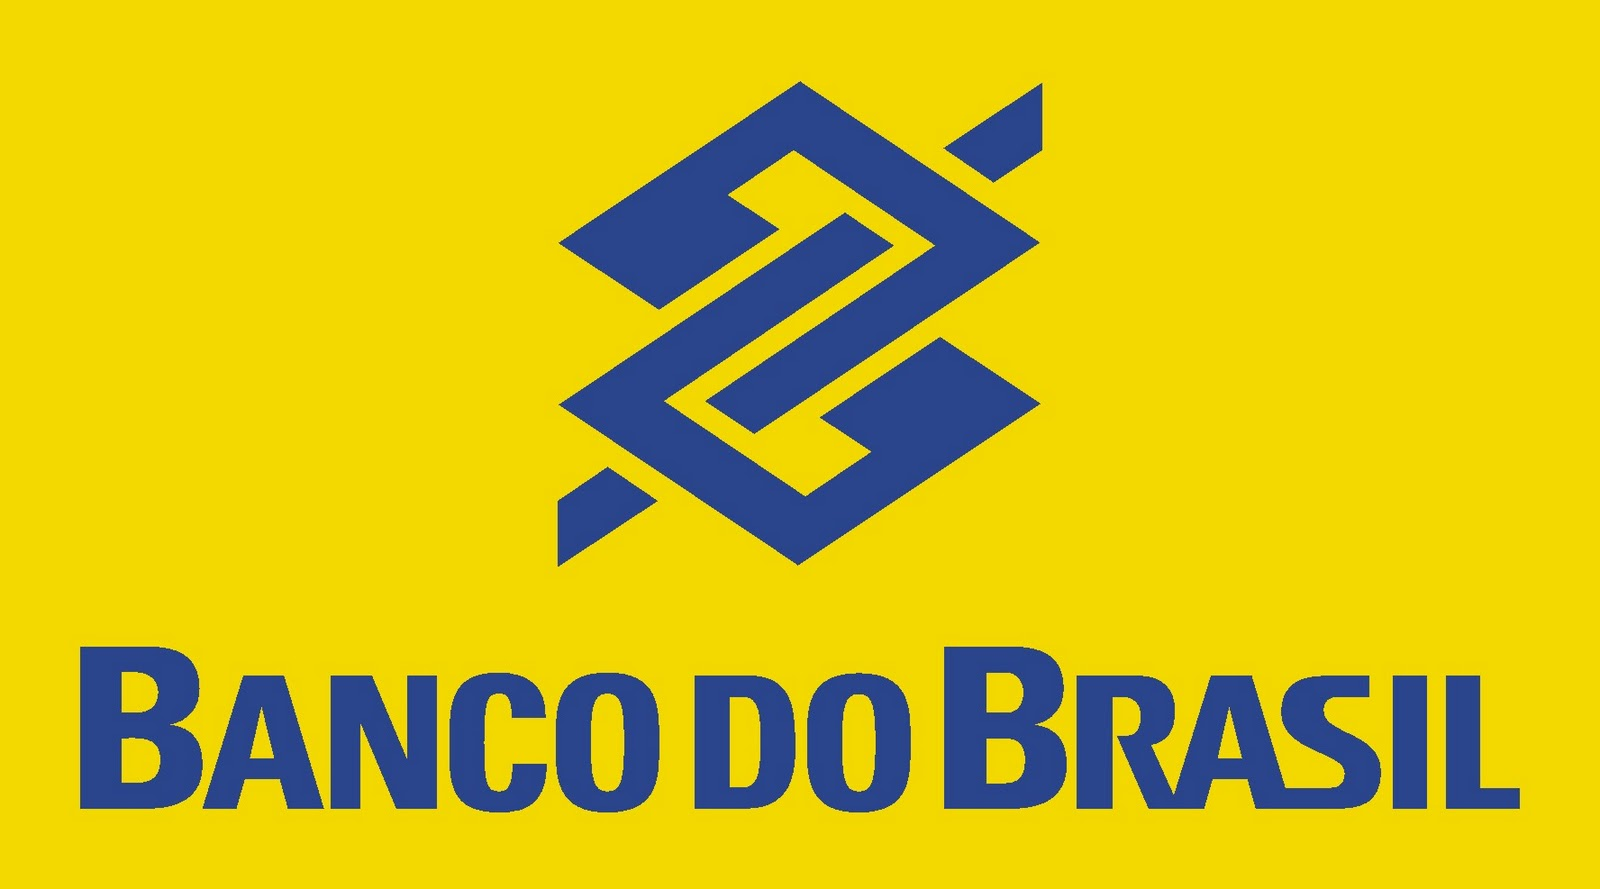 banco-do-brasil-concurso-por-dentro-dos-detalhes